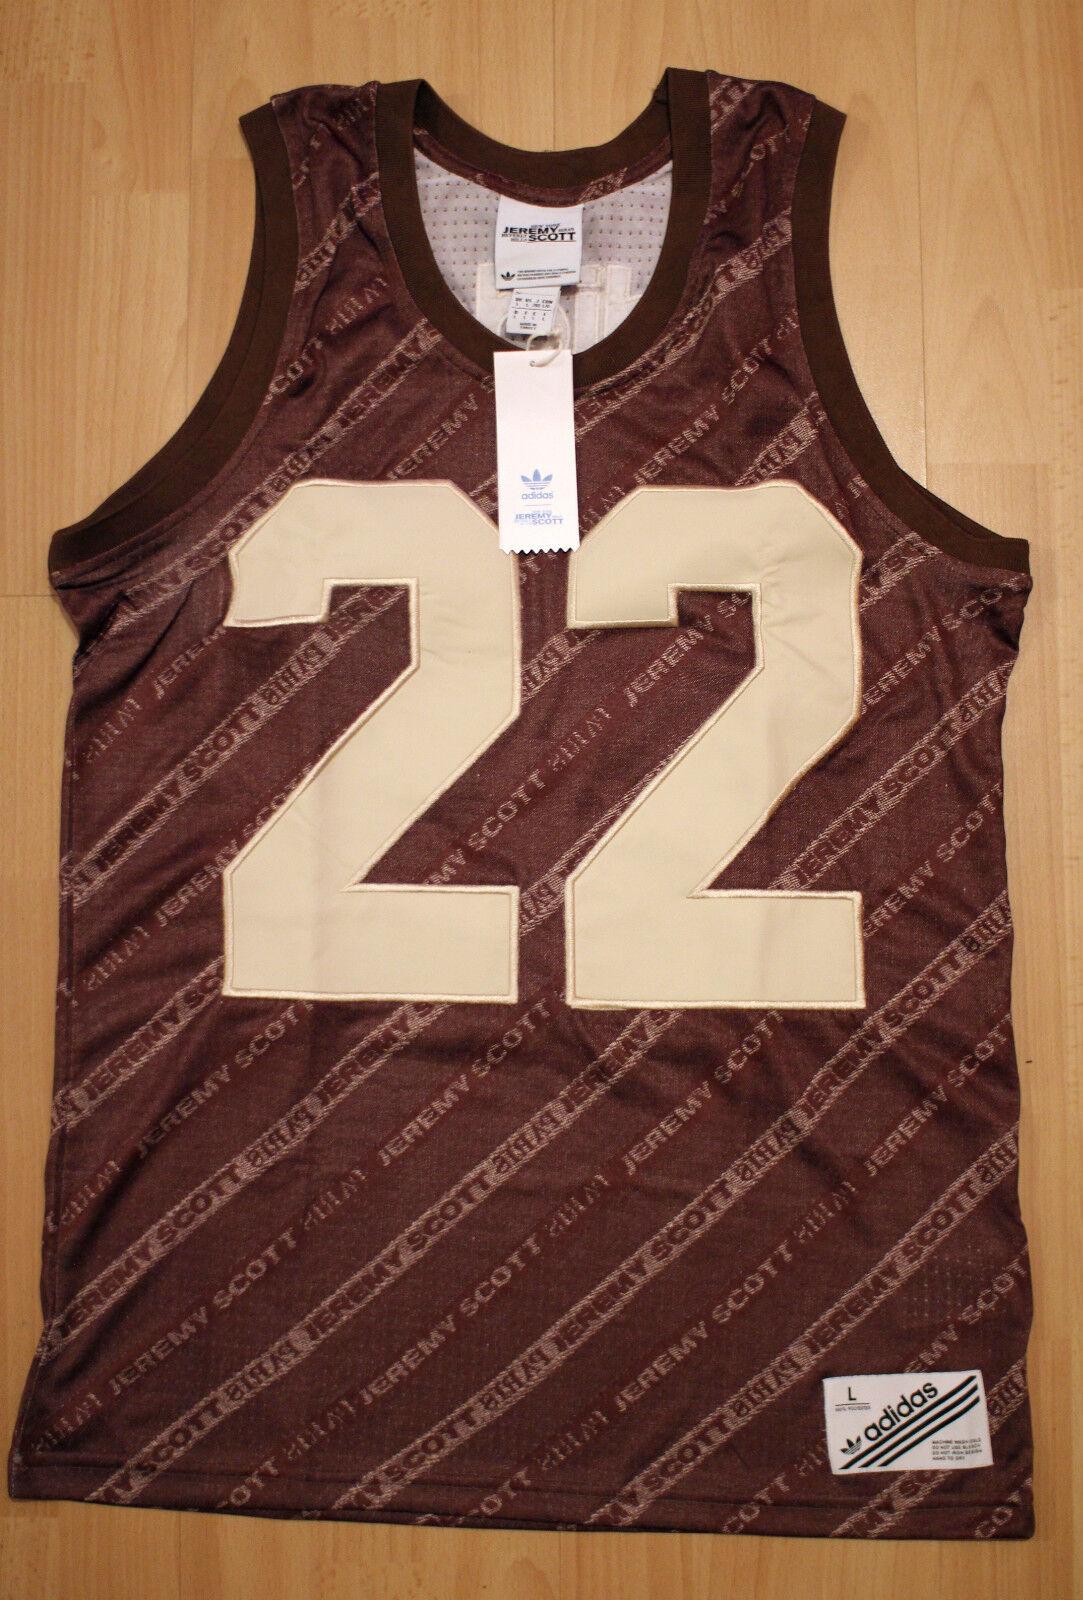 Adidas JS Basket Shirt Tank Top Jeremy Scott Hemd ObyO Gr. S,M,L,XL Neu